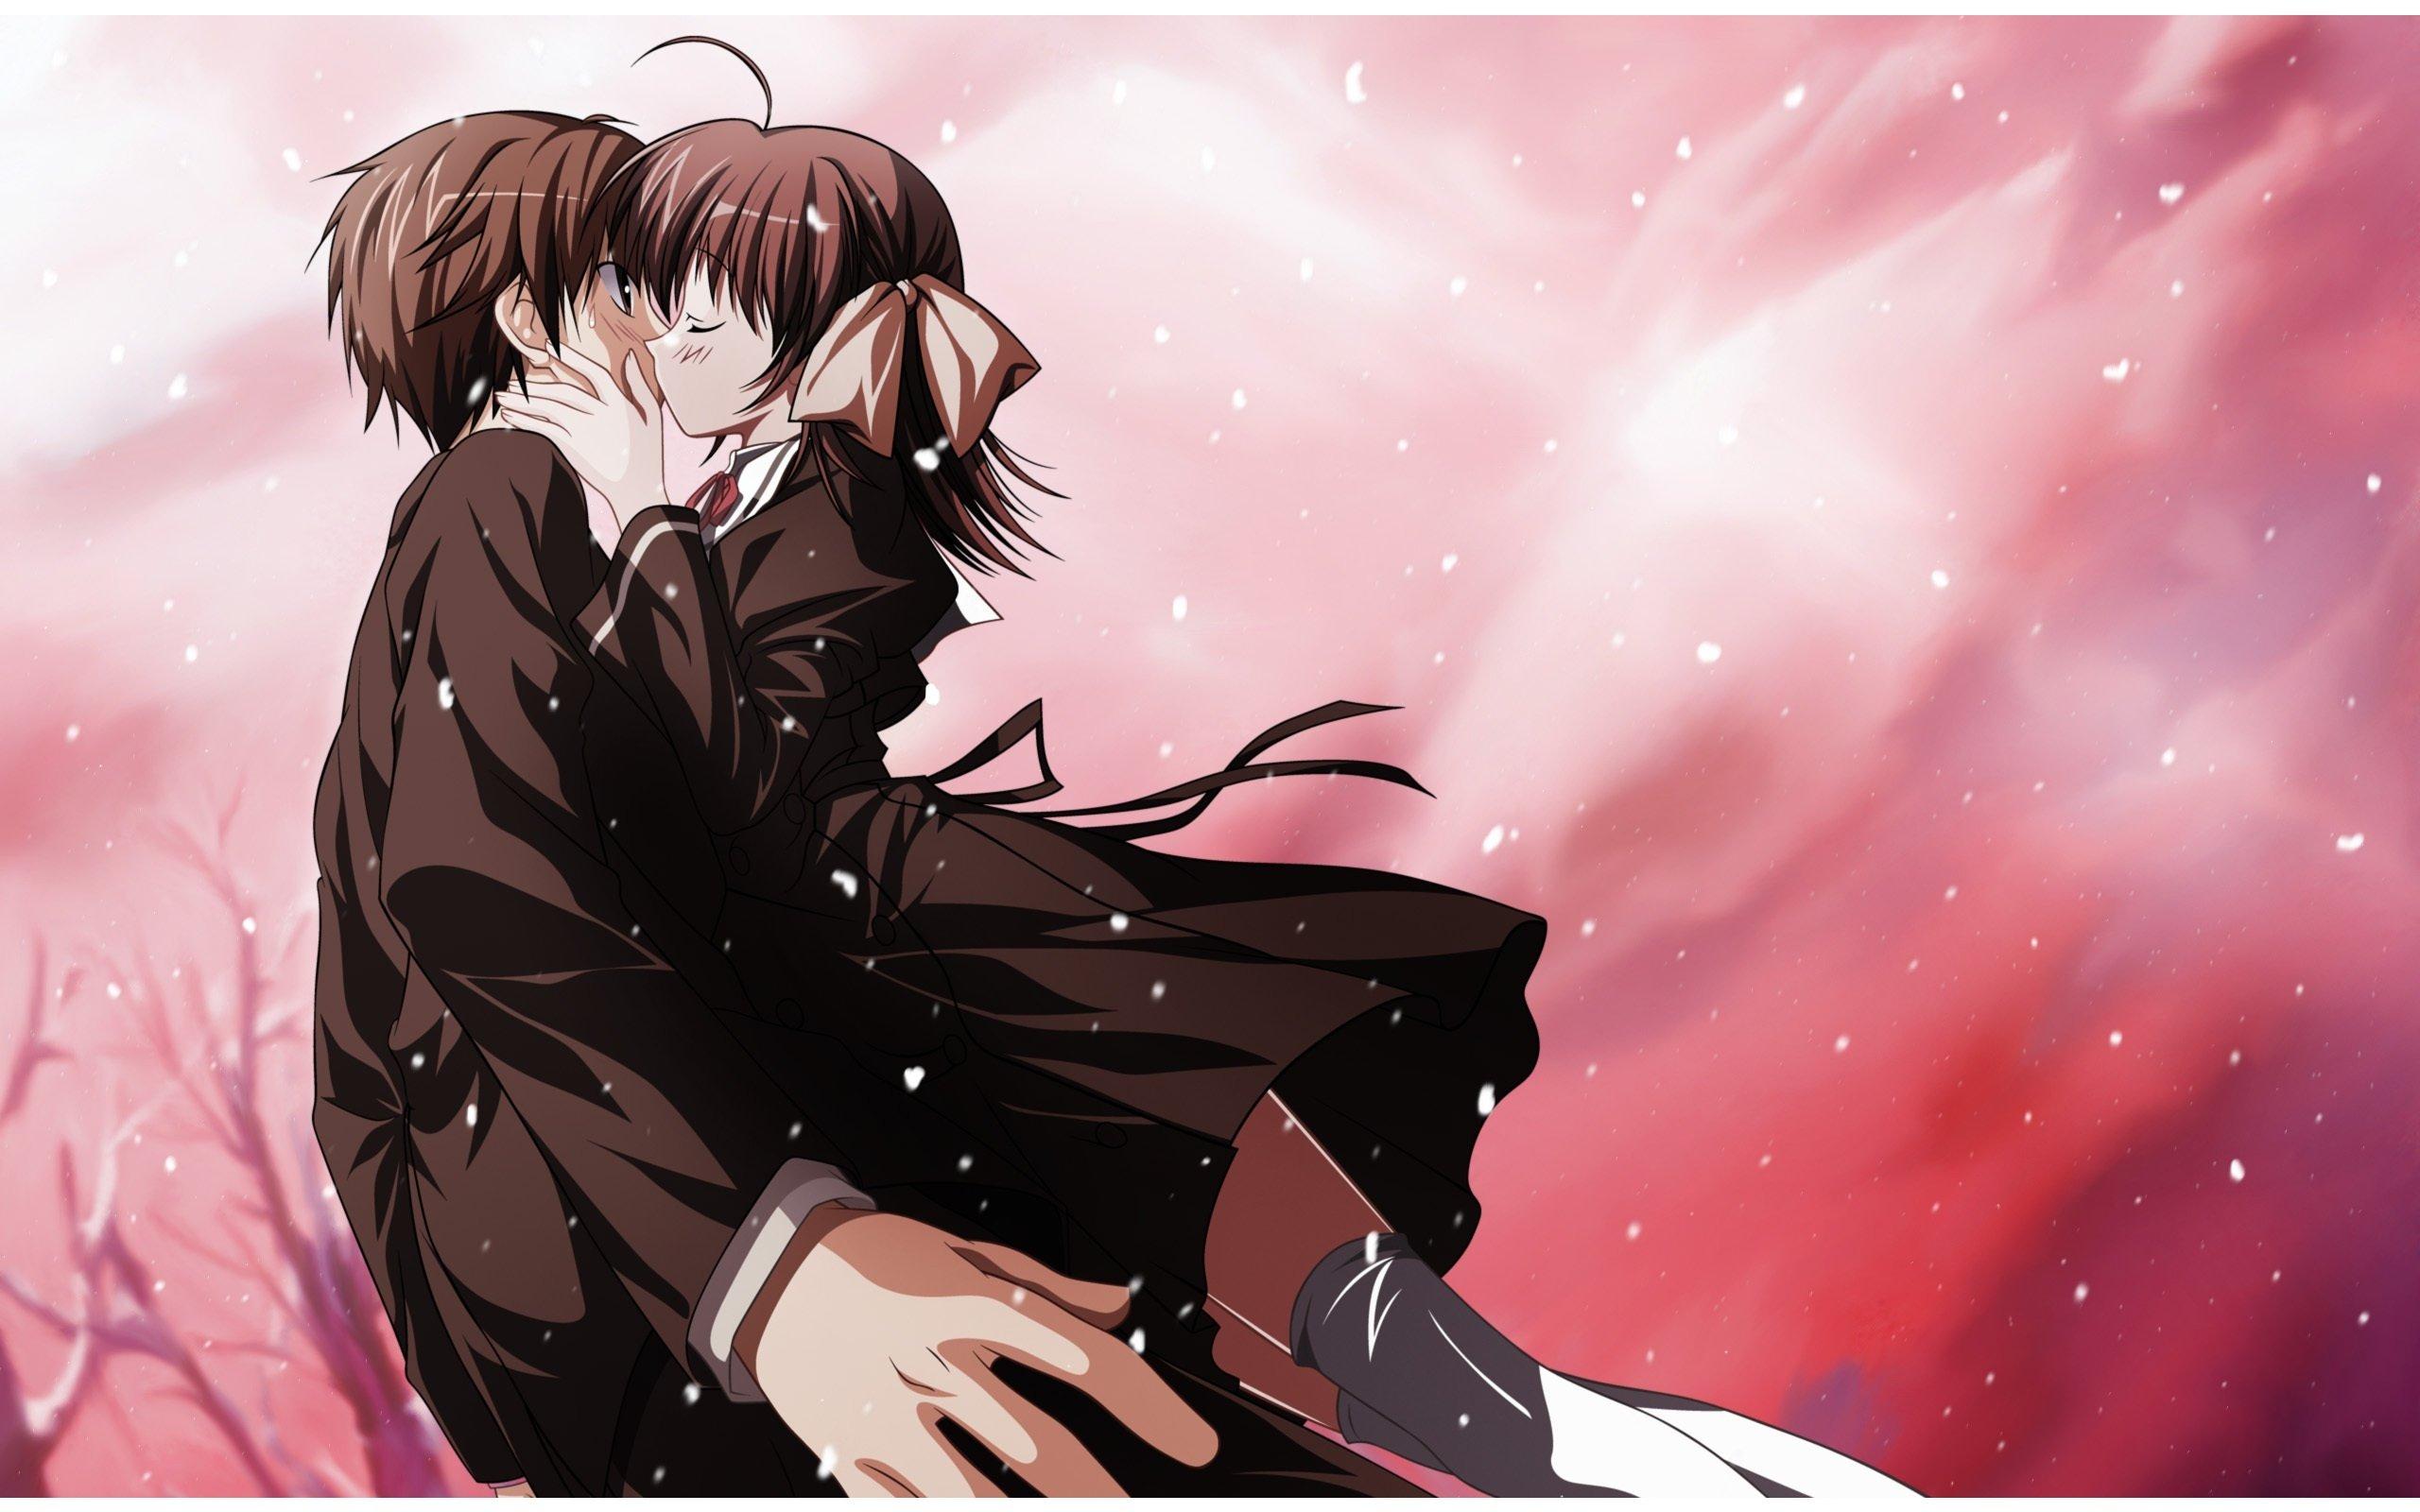 kiss Anime love scenes